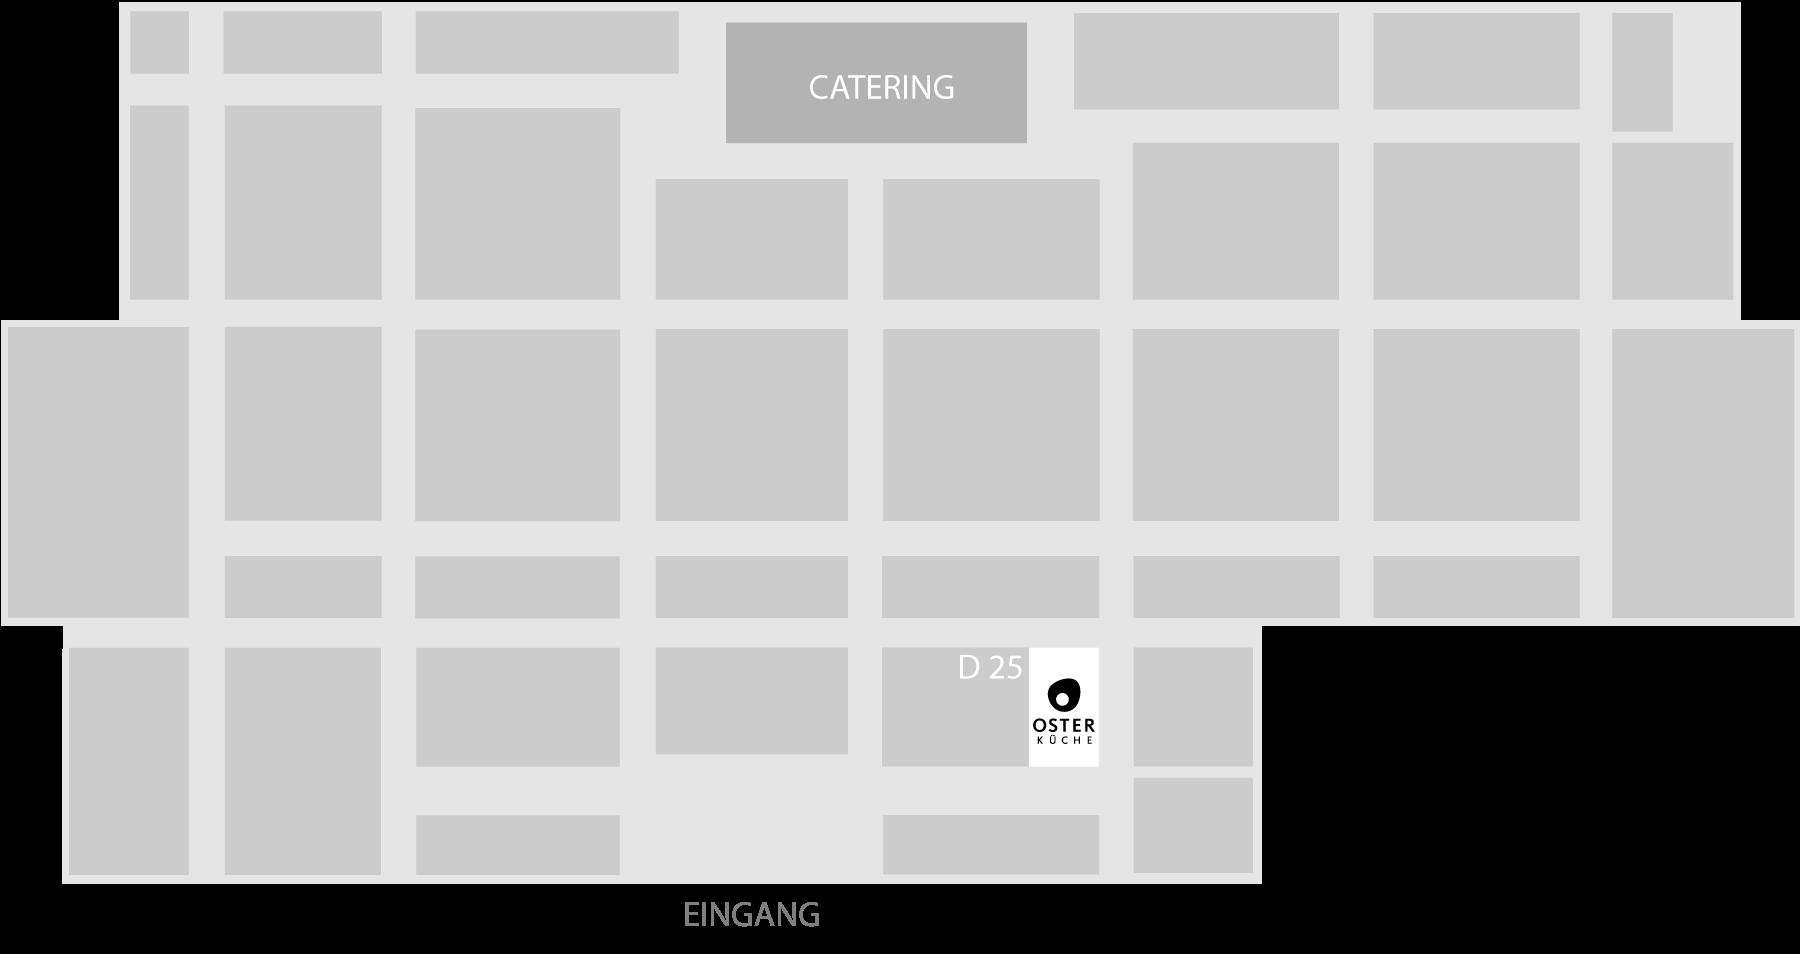 area30 Hallenplan 2021, Stand D 25, Oster Küche